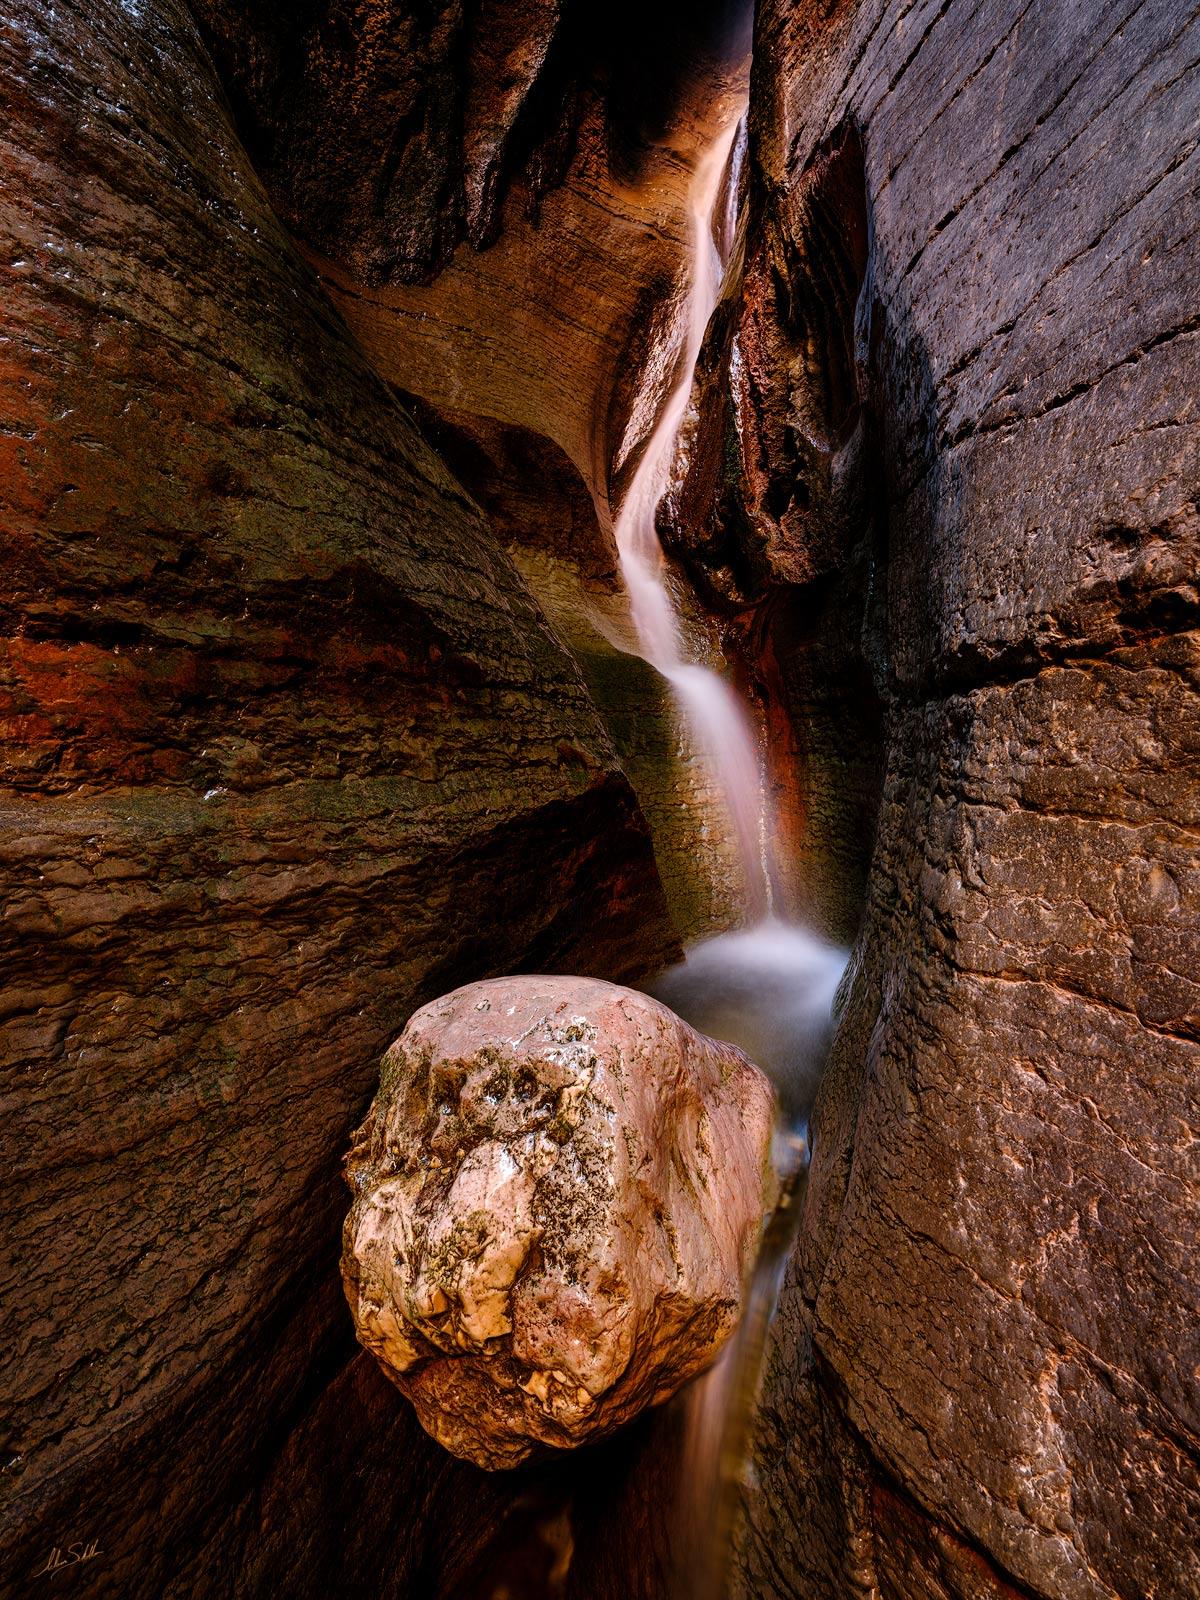 Chockstone, Expedition, FujiFilm, GFX, GFX 100, Grand Canyon, National Park, River Trip, Saddle Canyon, Waterfall, photo